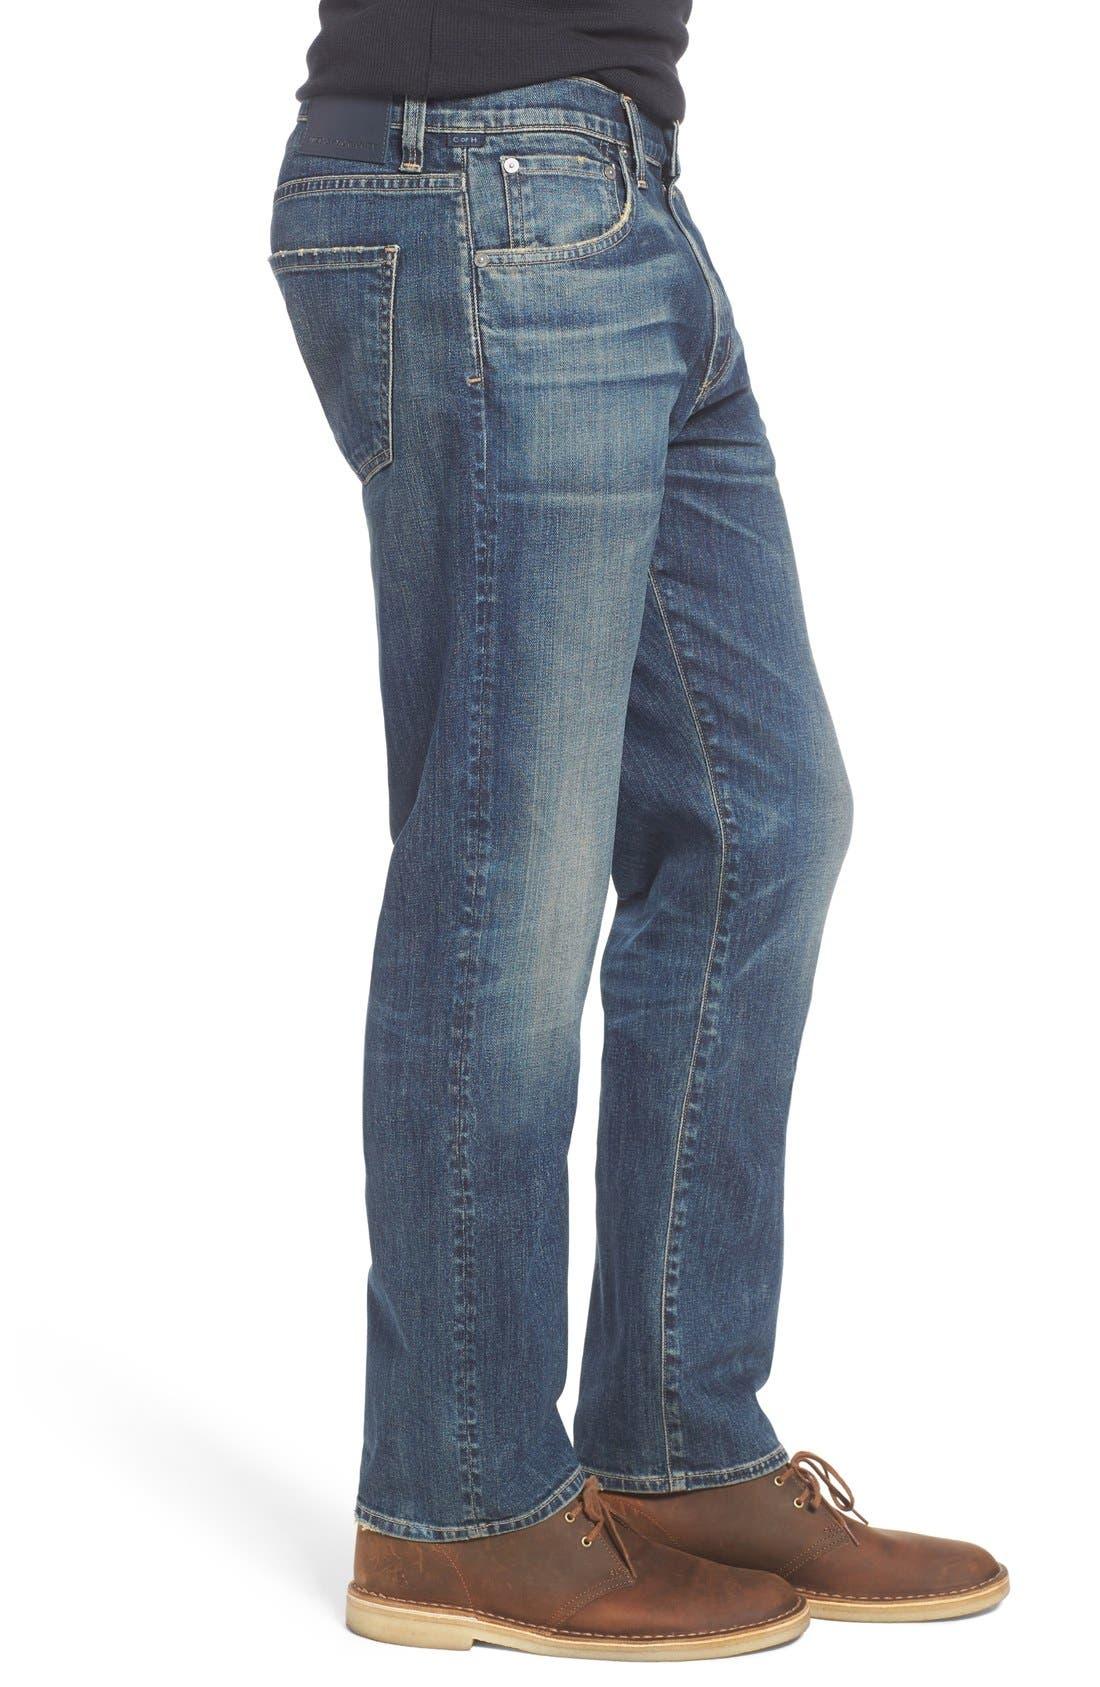 Gage Slim Straight Leg Jeans,                             Alternate thumbnail 9, color,                             DUNES